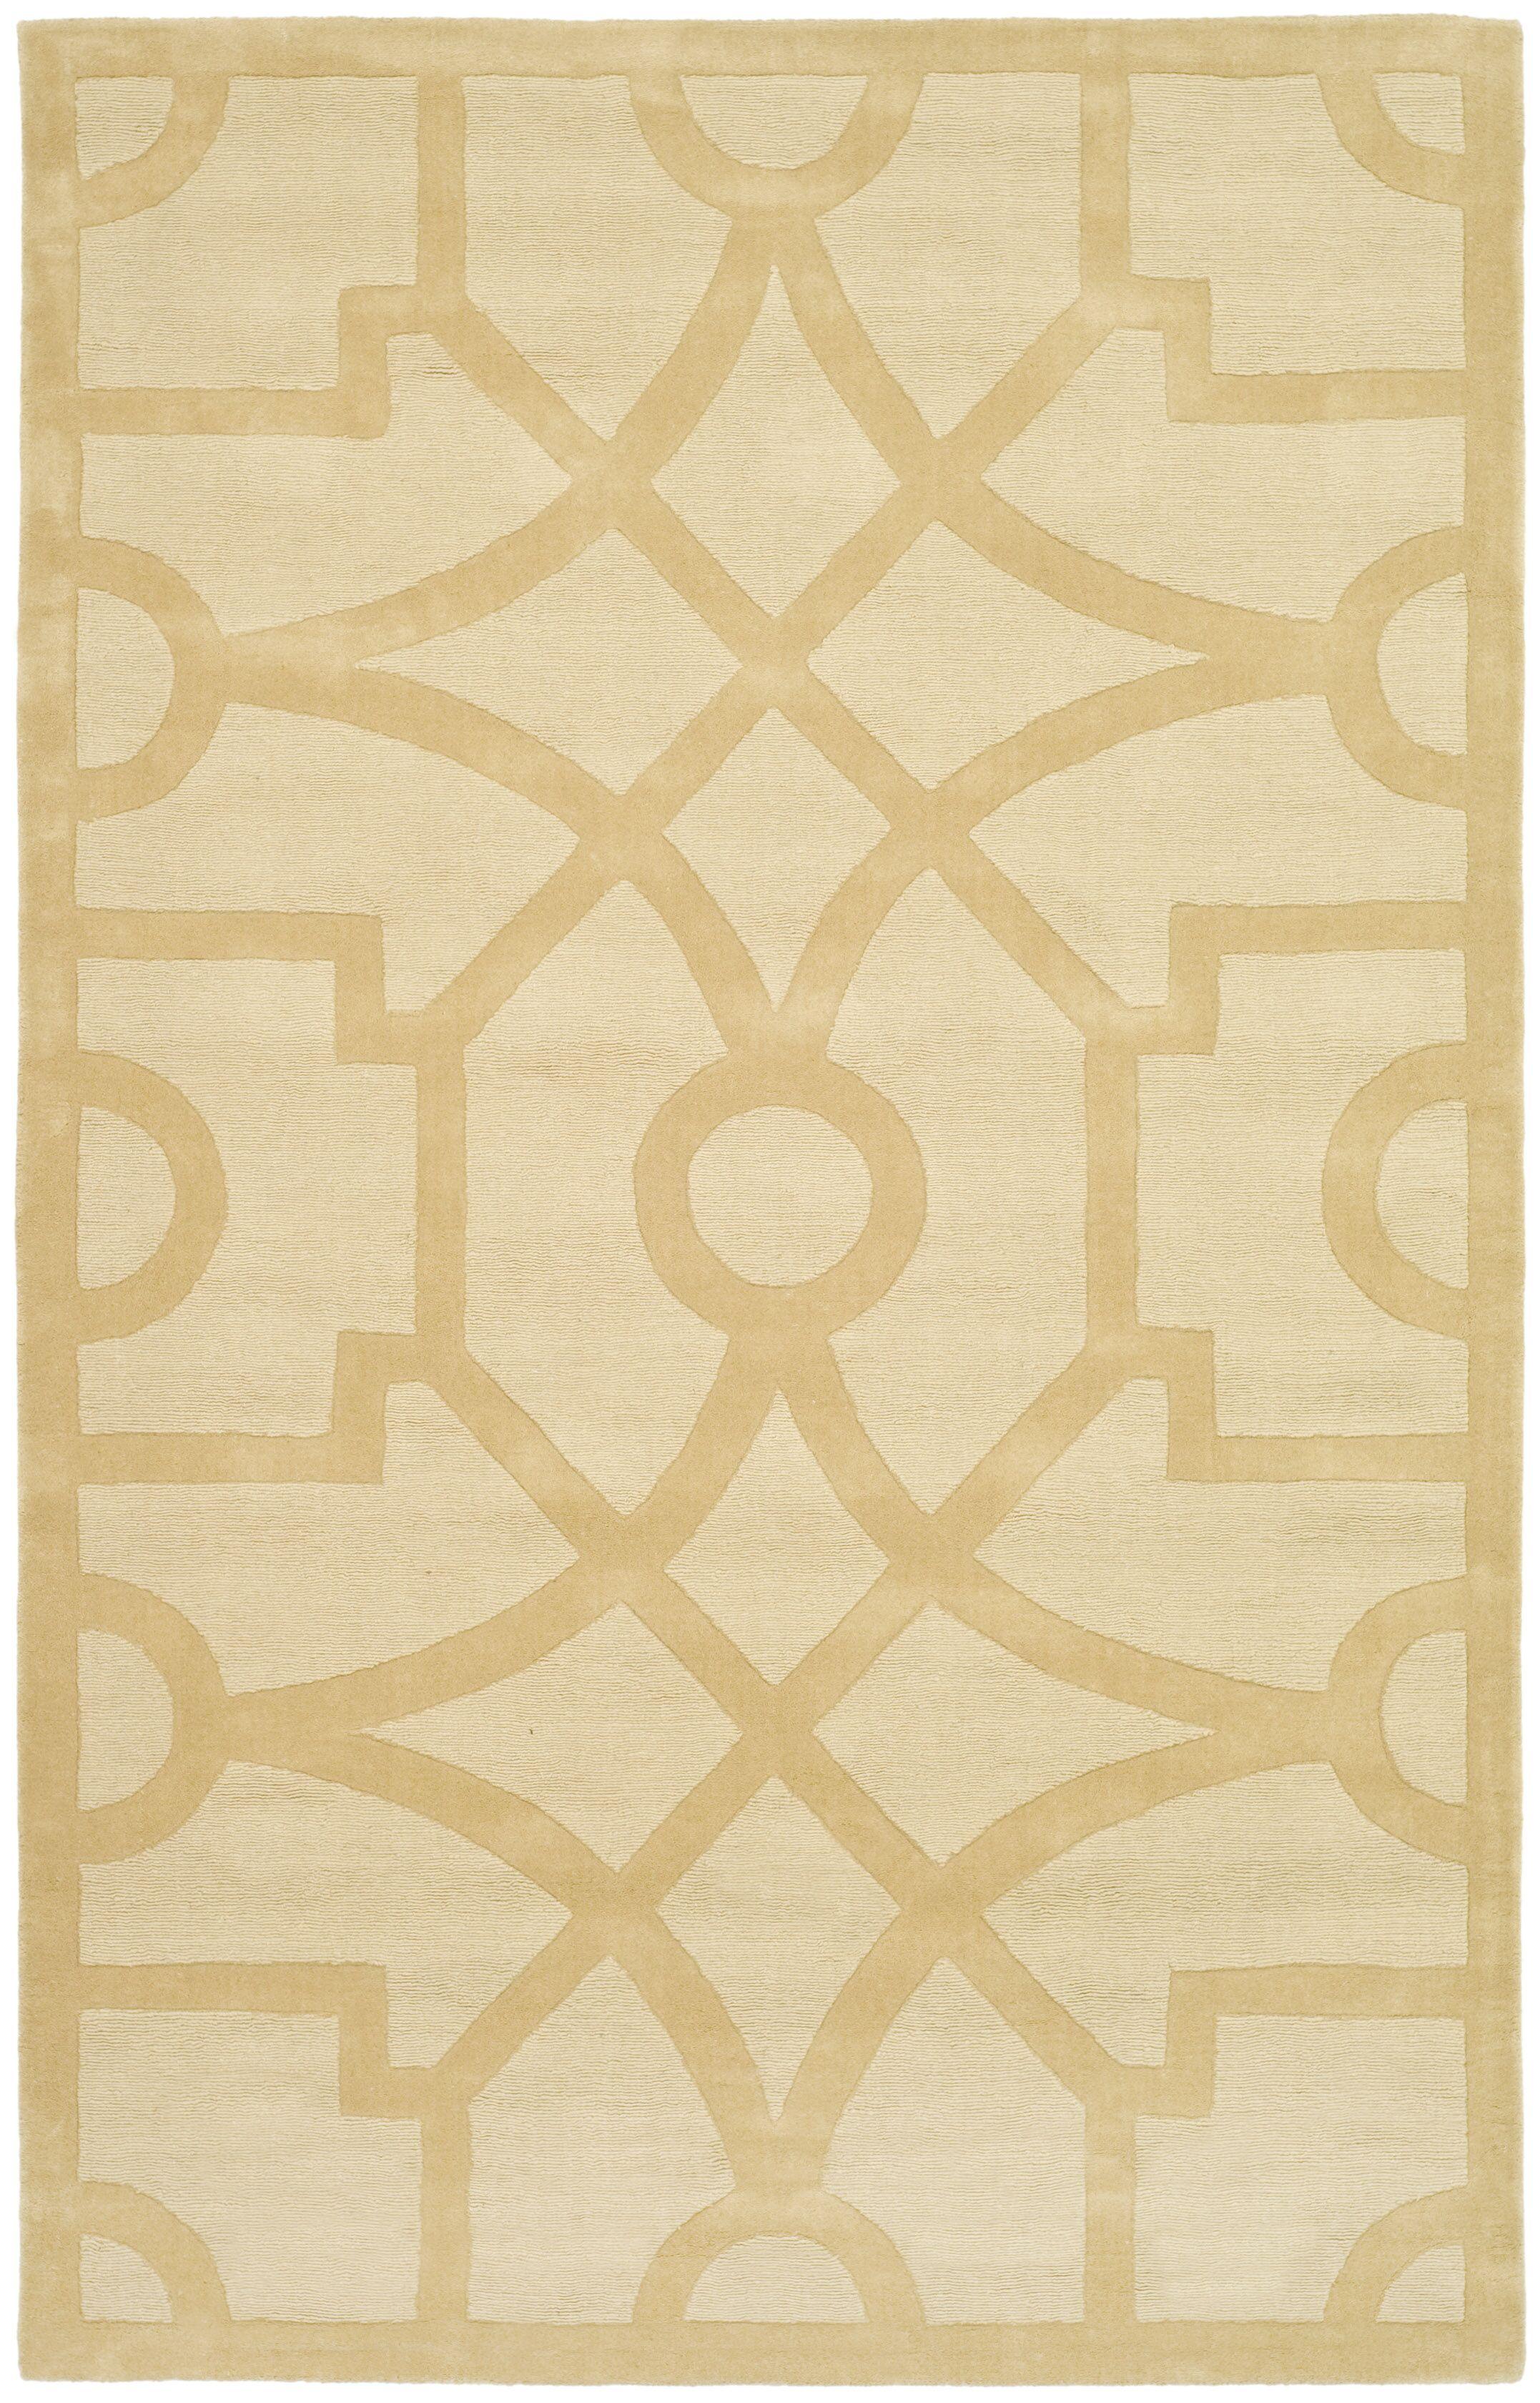 Martha Stewart Fretwork Gravel Area Rug Rug Size: Rectangle 3' x 5'